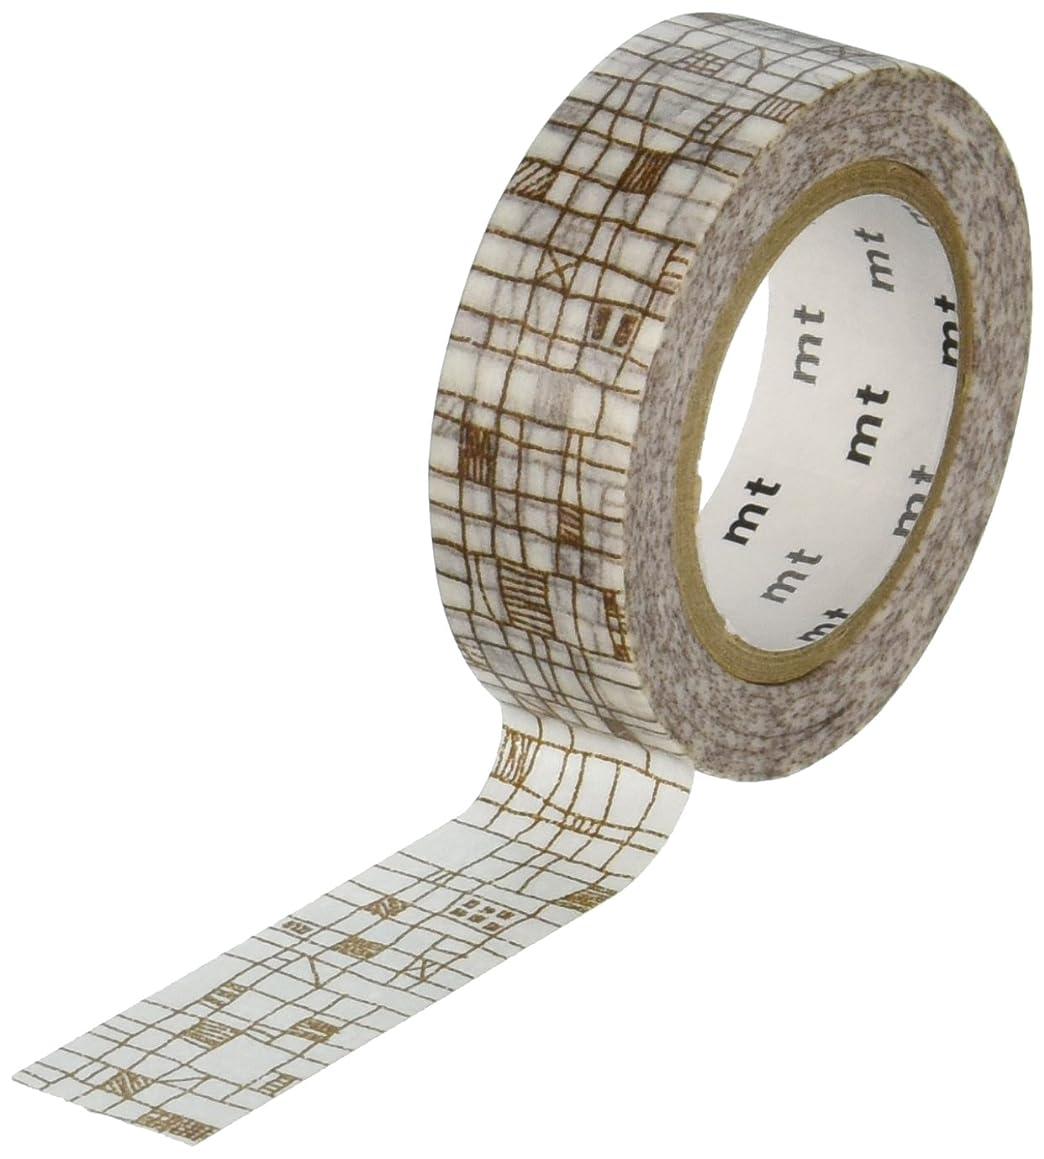 MT Washi Masking Tape, 1P Deco, 15mm x 10m, Line Pbrown (MT01D292)